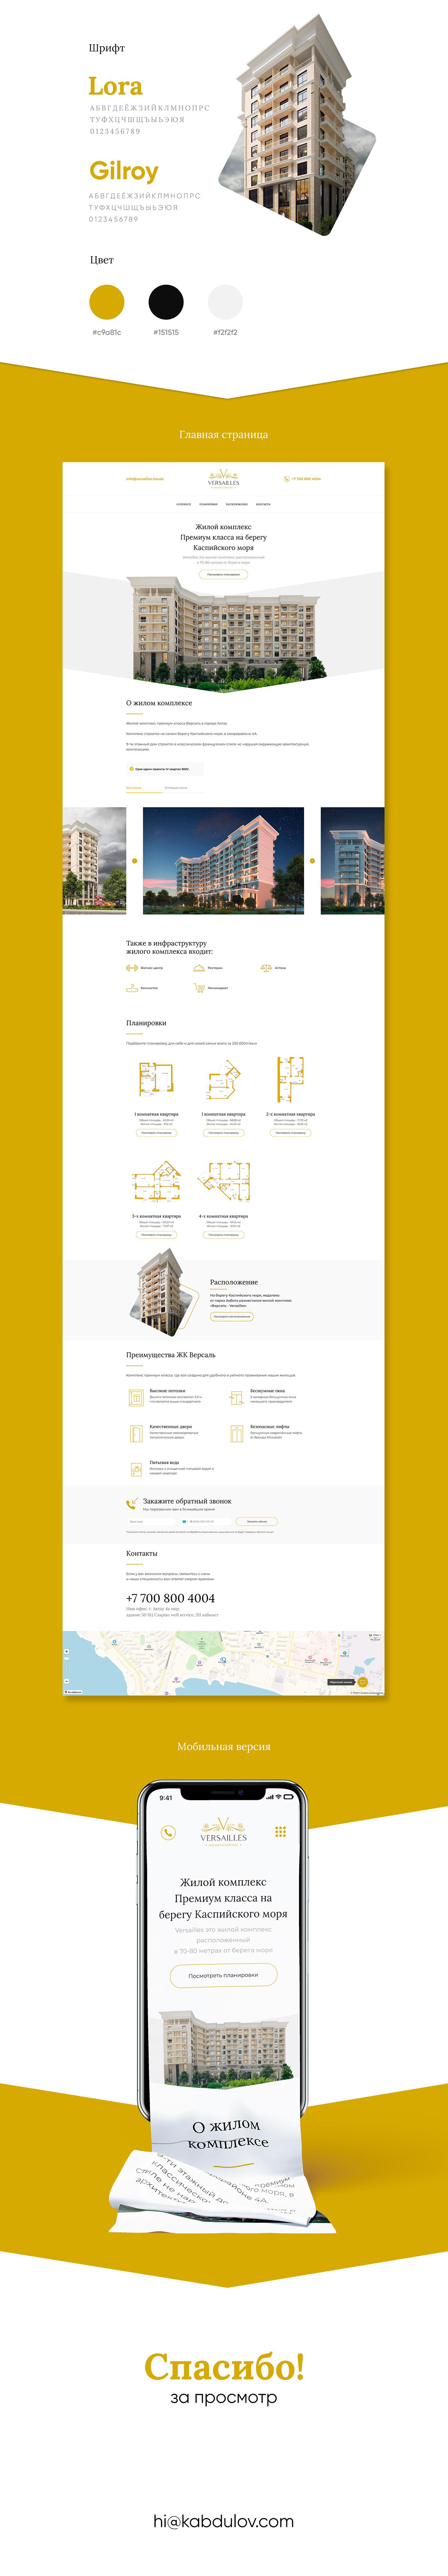 residential complex house versailles Web Design